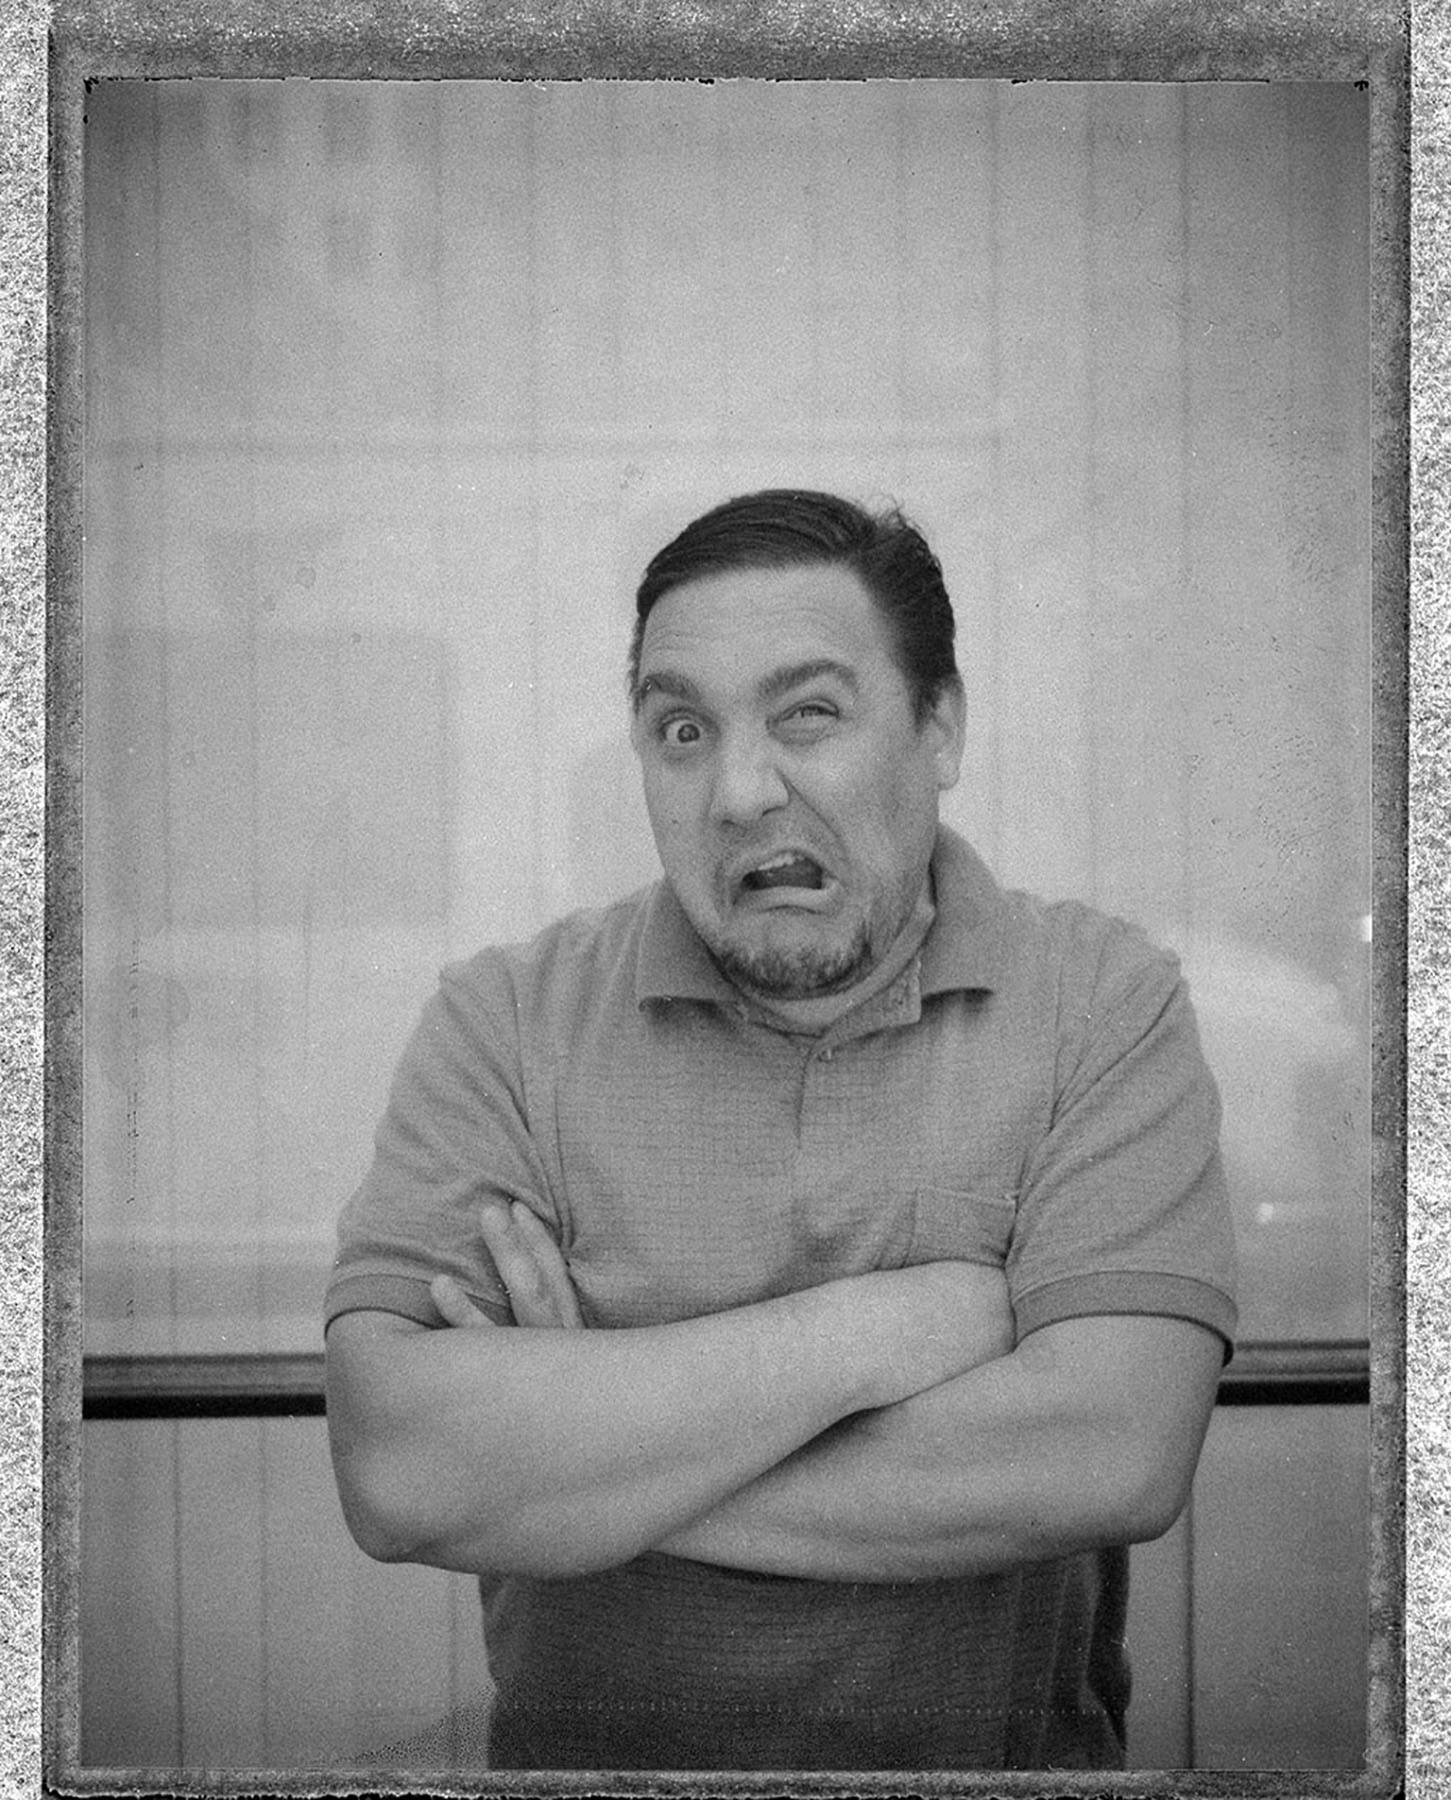 Sam Margulis   Polaroid Land Camera 240   Jordan Urie